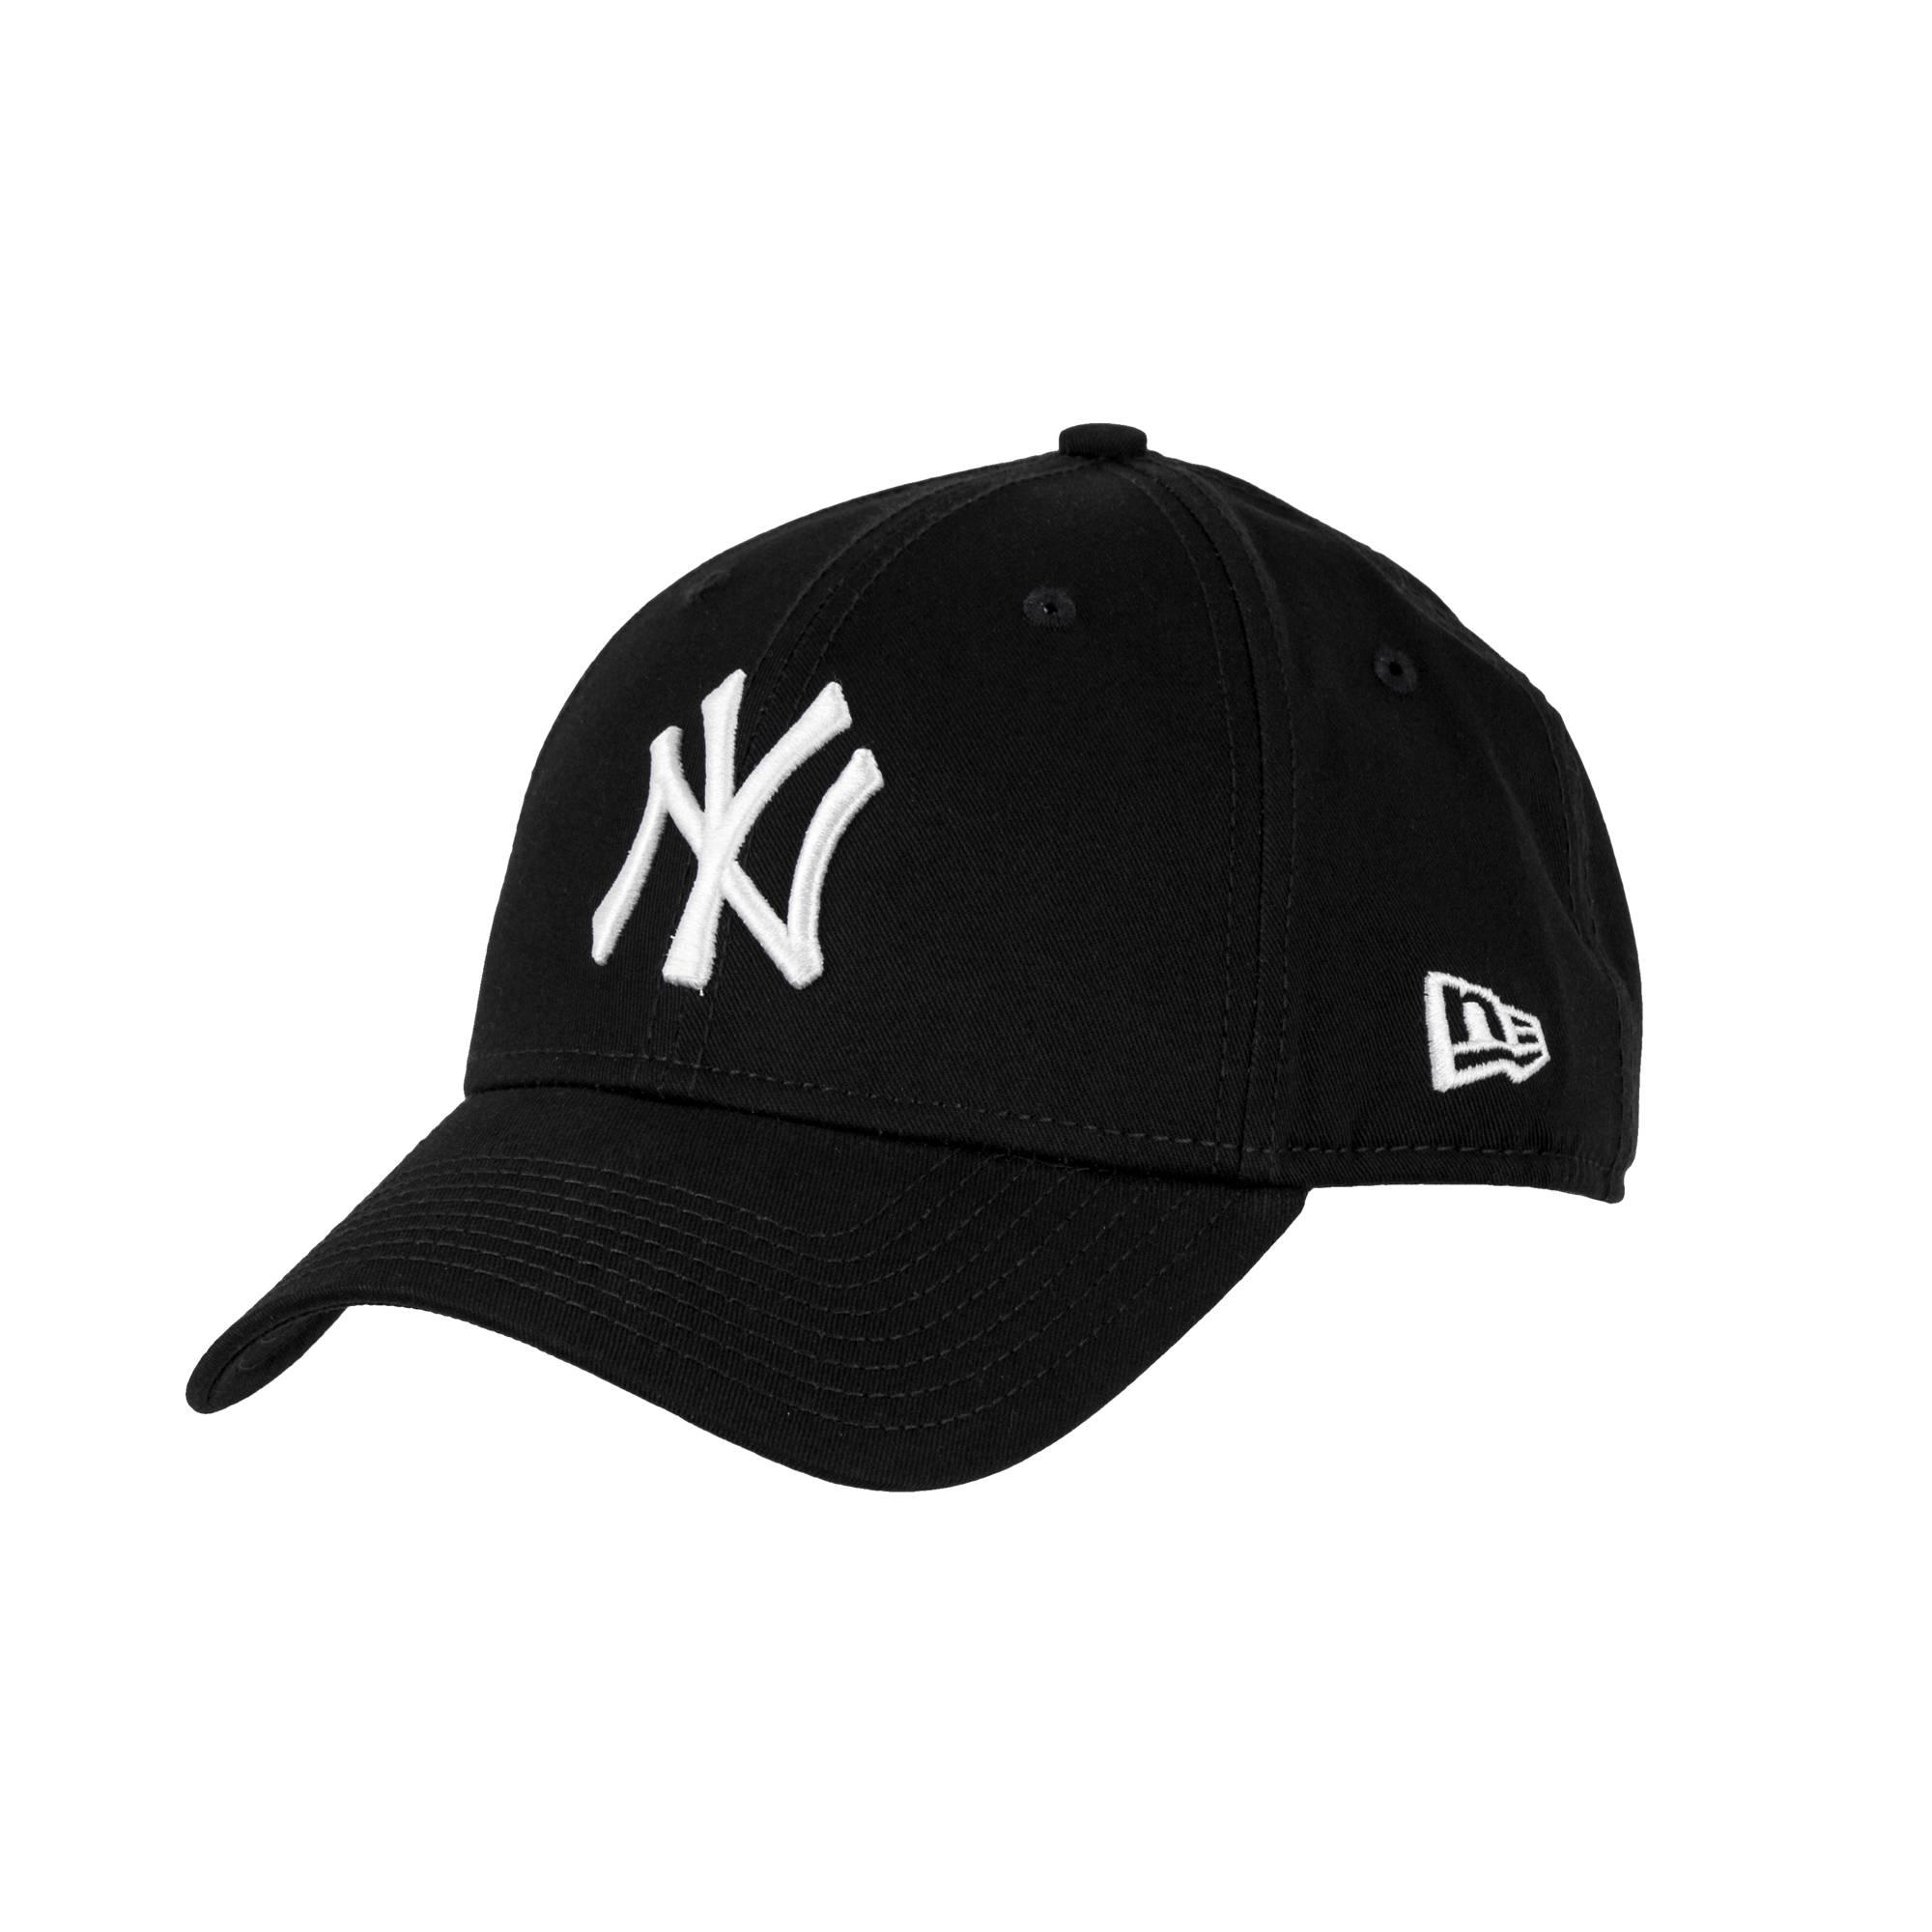 79aabc2b15dd4 NEW ERA - Gorra Adjustable NY Yankees 9 Forty Negro